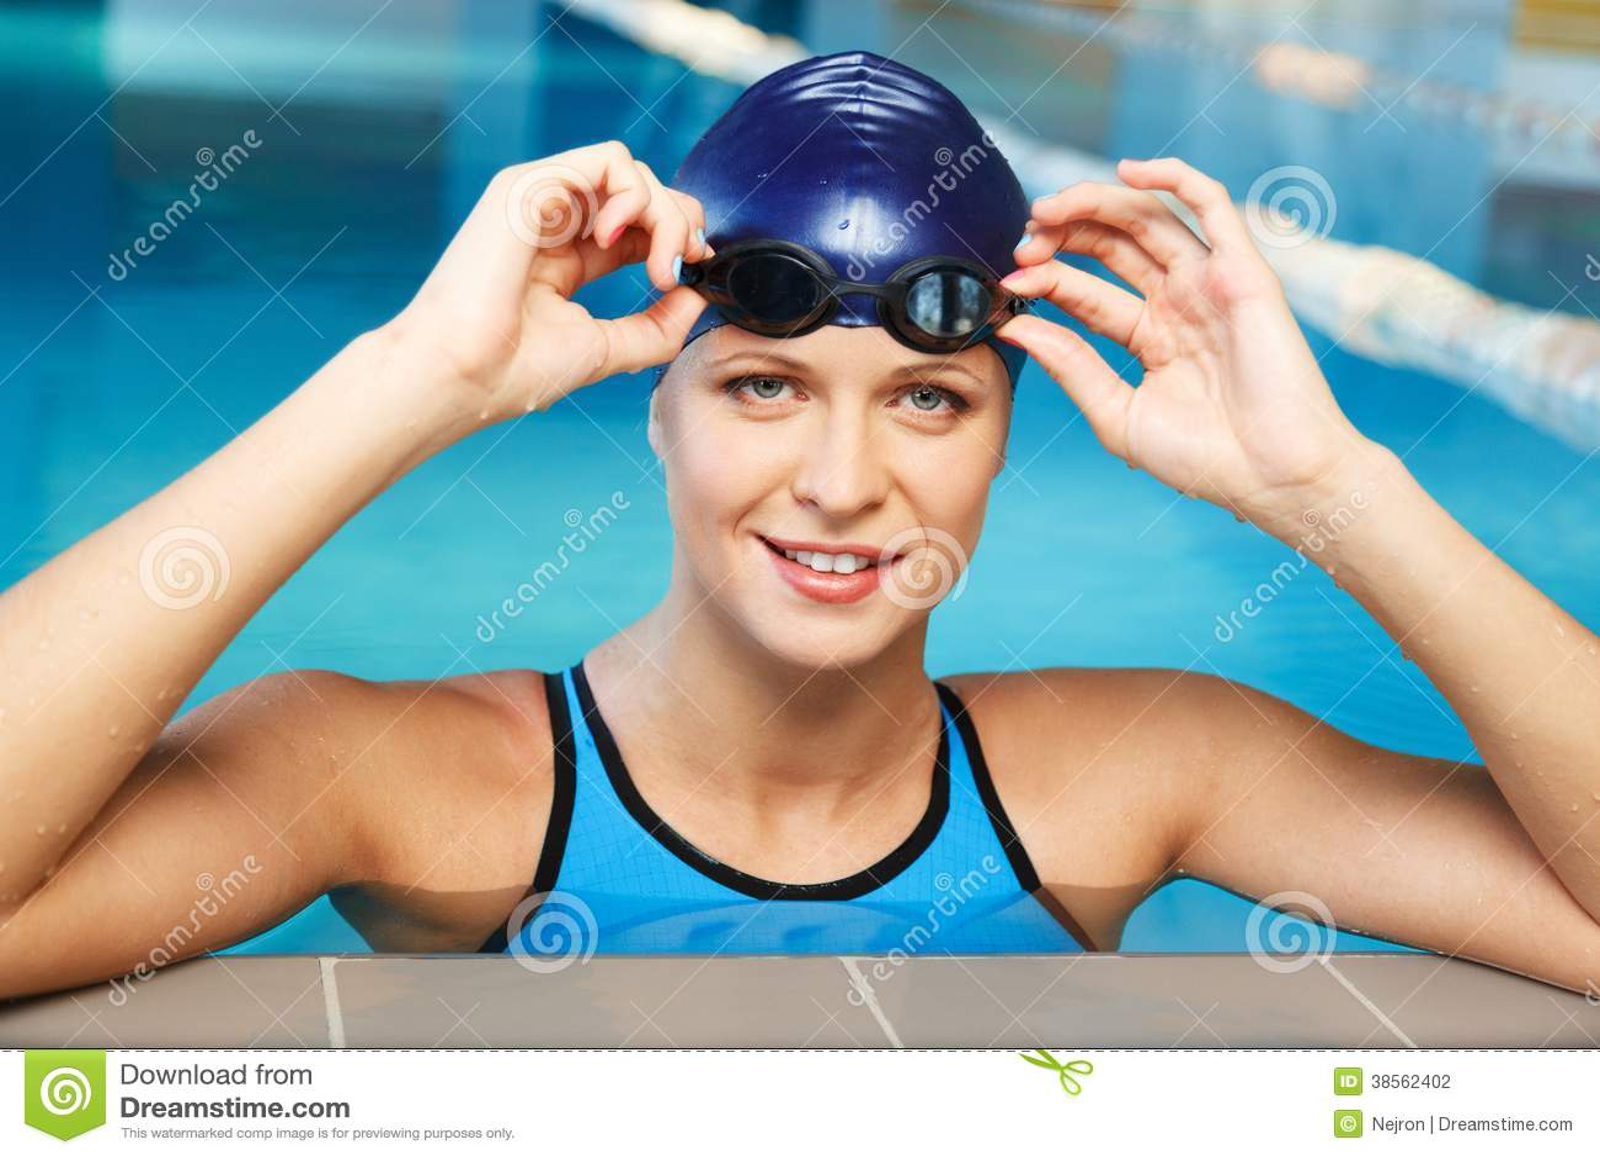 Woman in swimming suit near pool